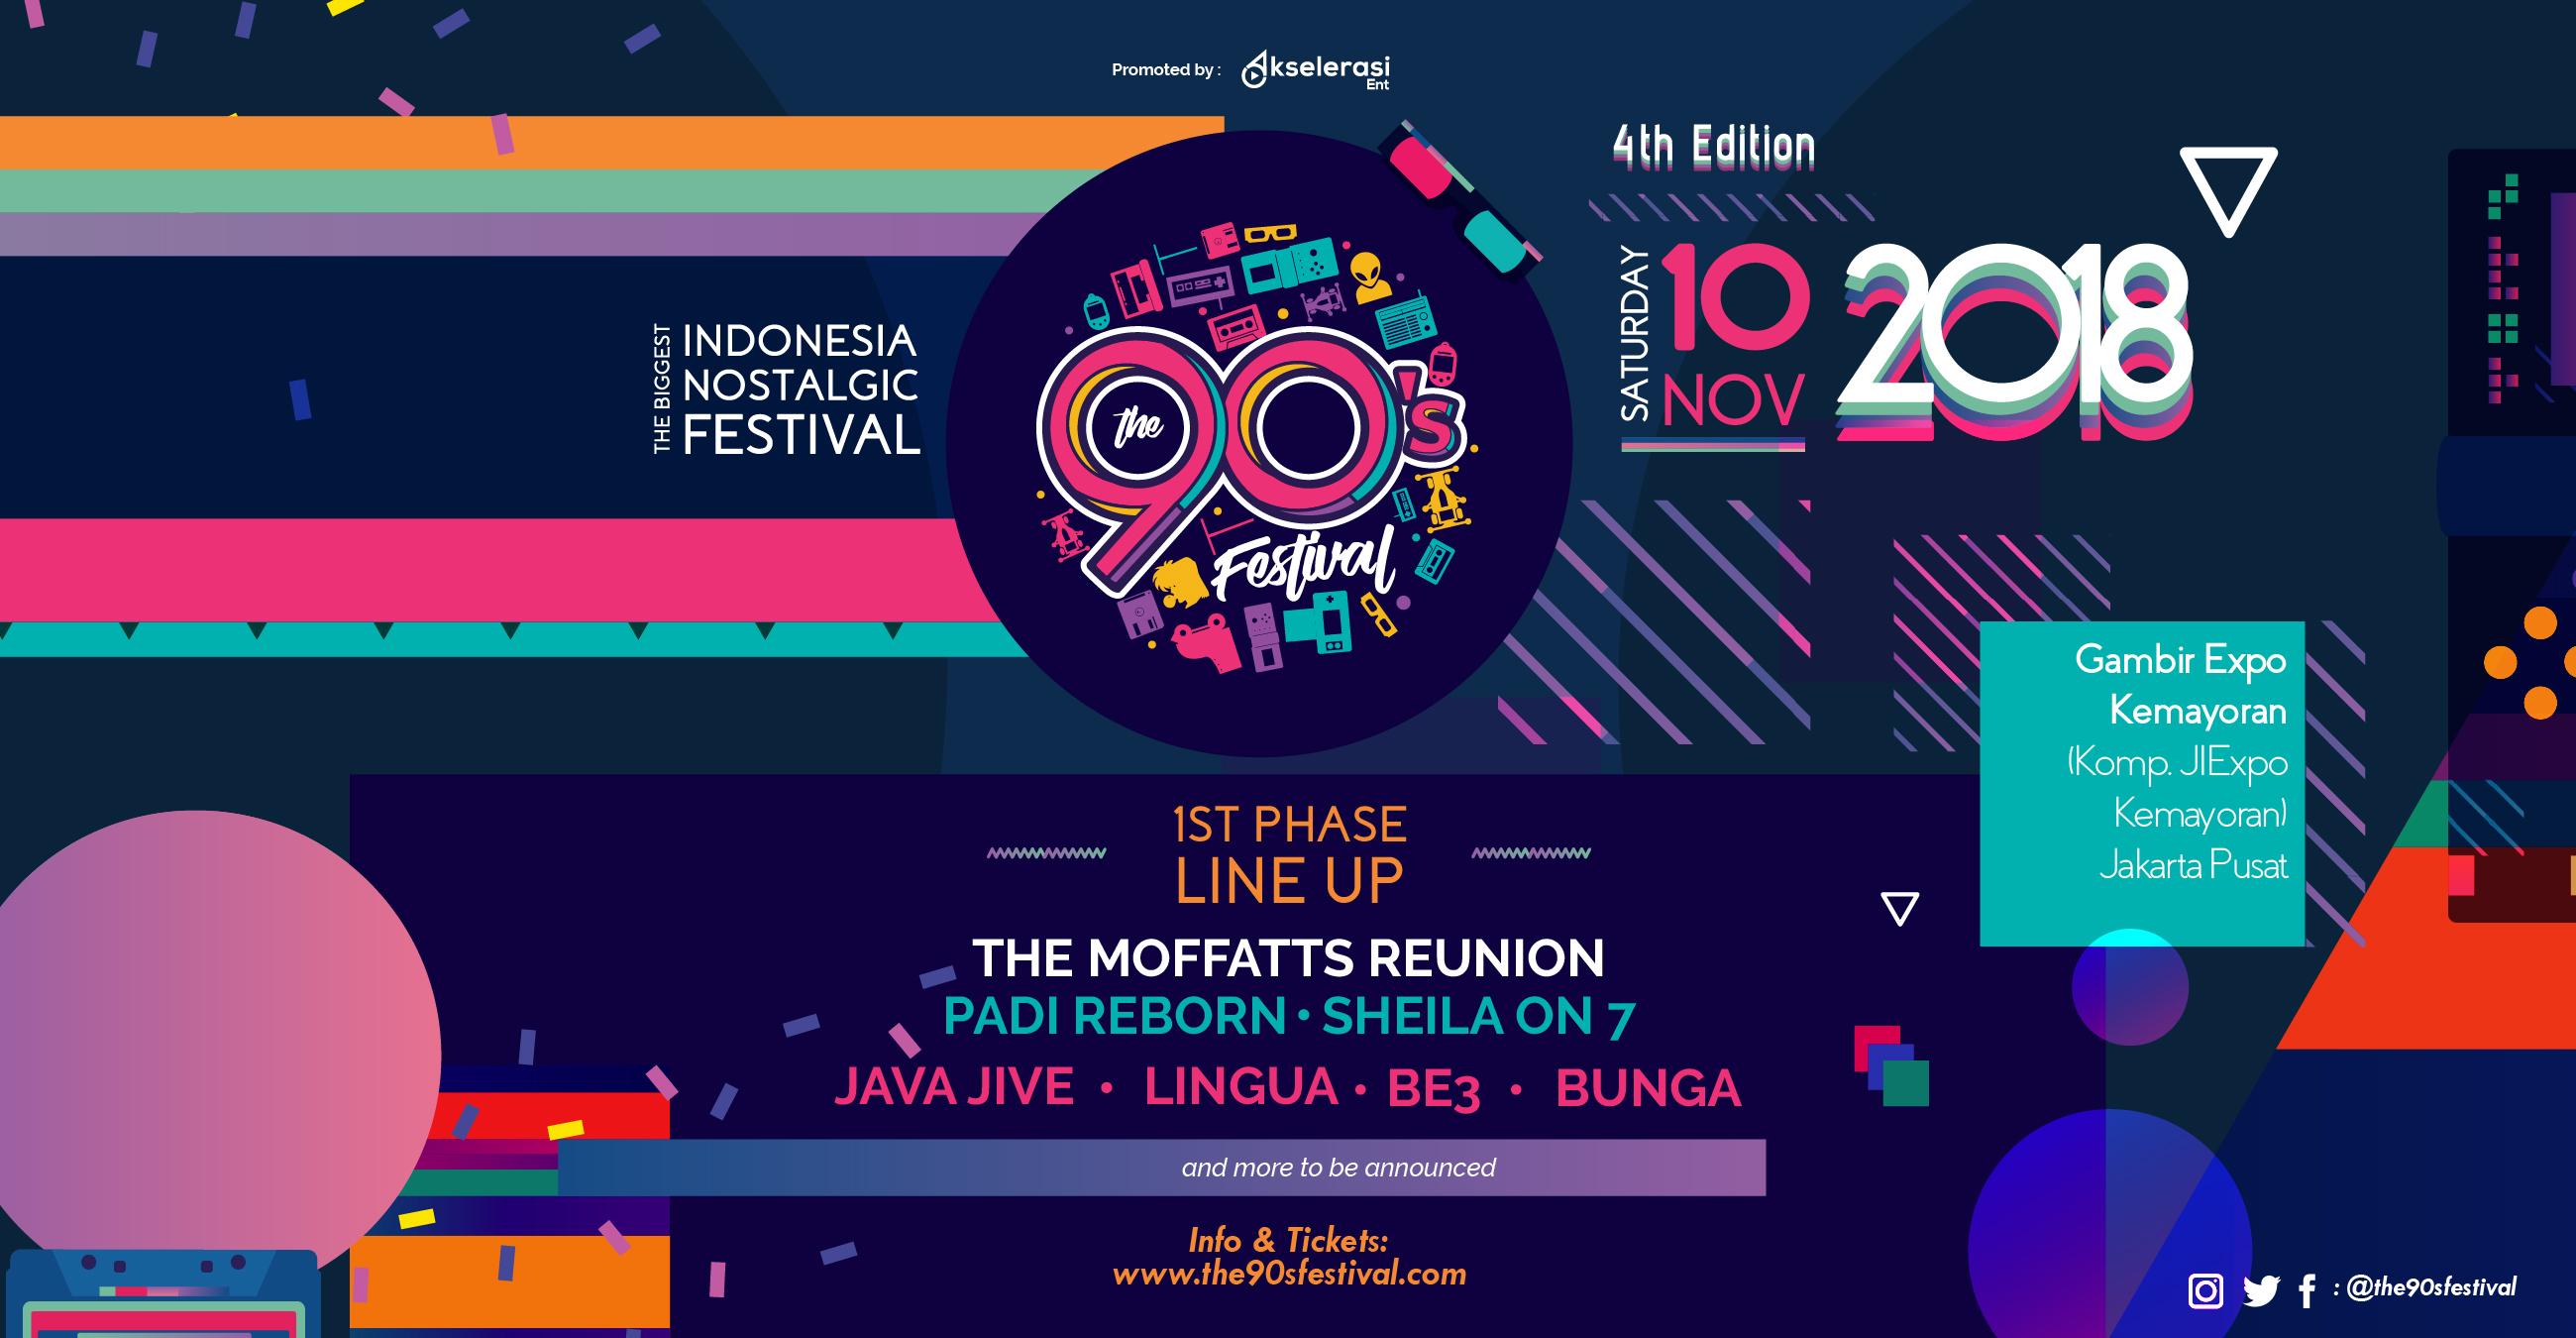 The 90's Festival 2018